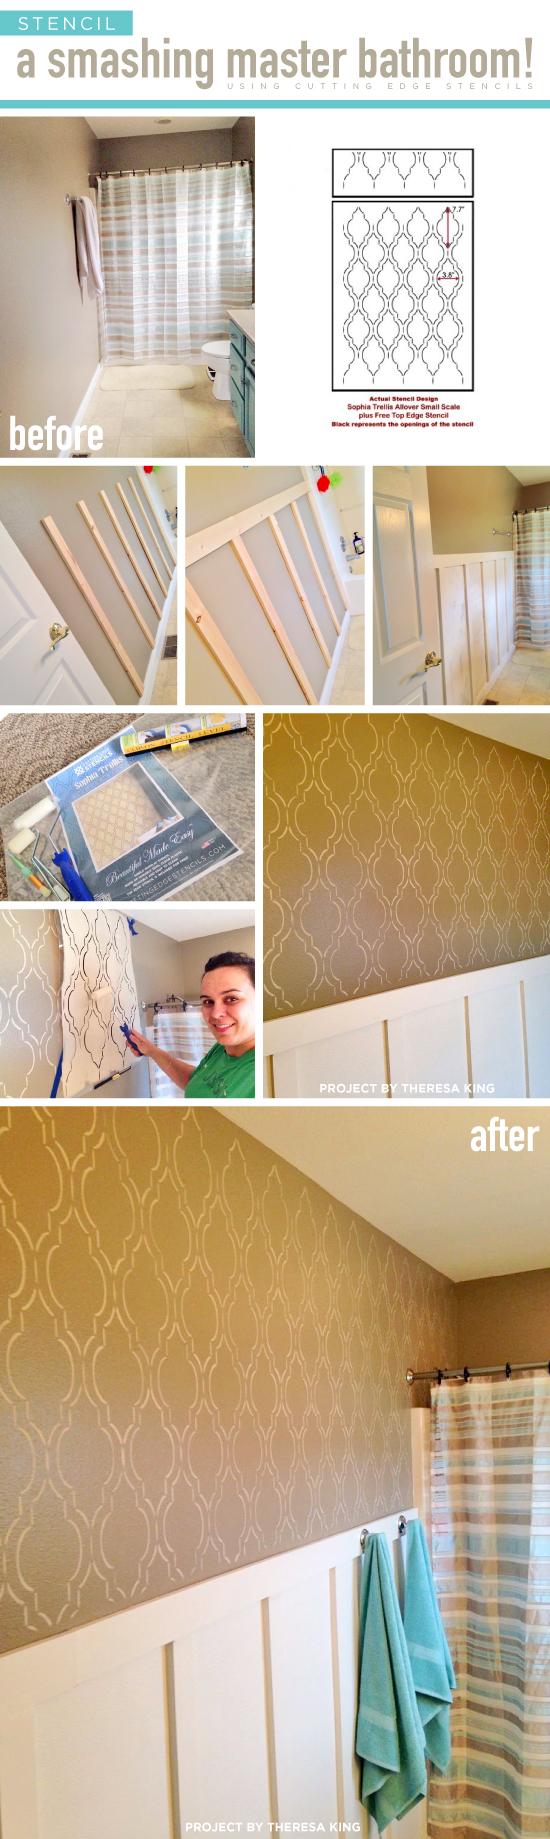 Cutting Edge Stencils shares a DIY stenciled bathroom makeover using the Sophia Trellis Allover Stencil. http://www.cuttingedgestencils.com/sophia-trellis-stencil-geometric-wall-pattern.html